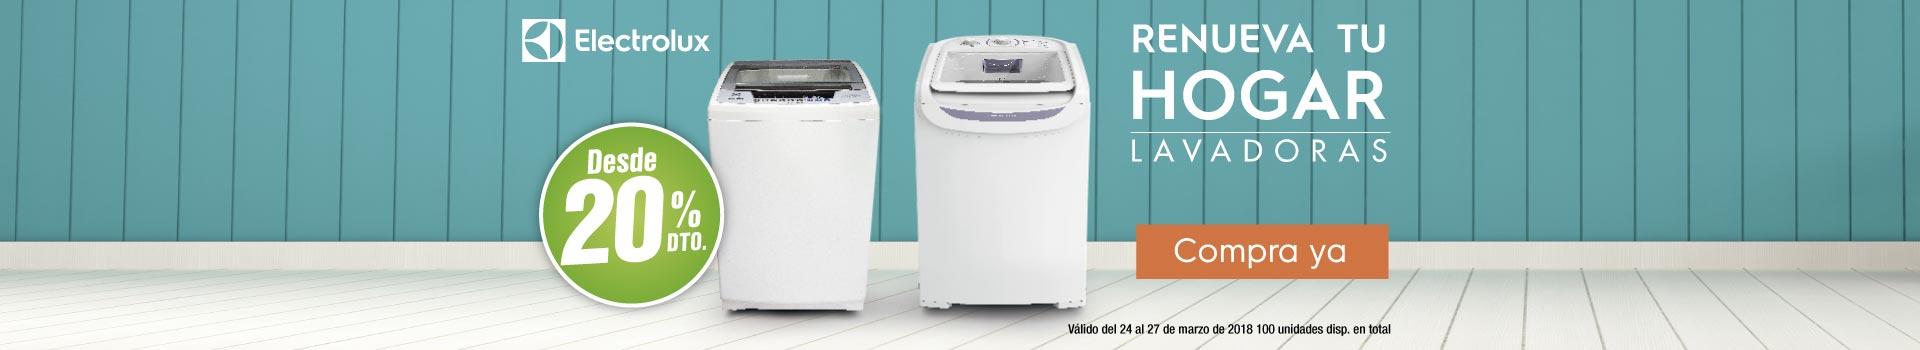 CAT-LAVSEC-AKyKT-6-lb-descuentos-Lavadoras-ELECTROLUX-cat-marzo24-27